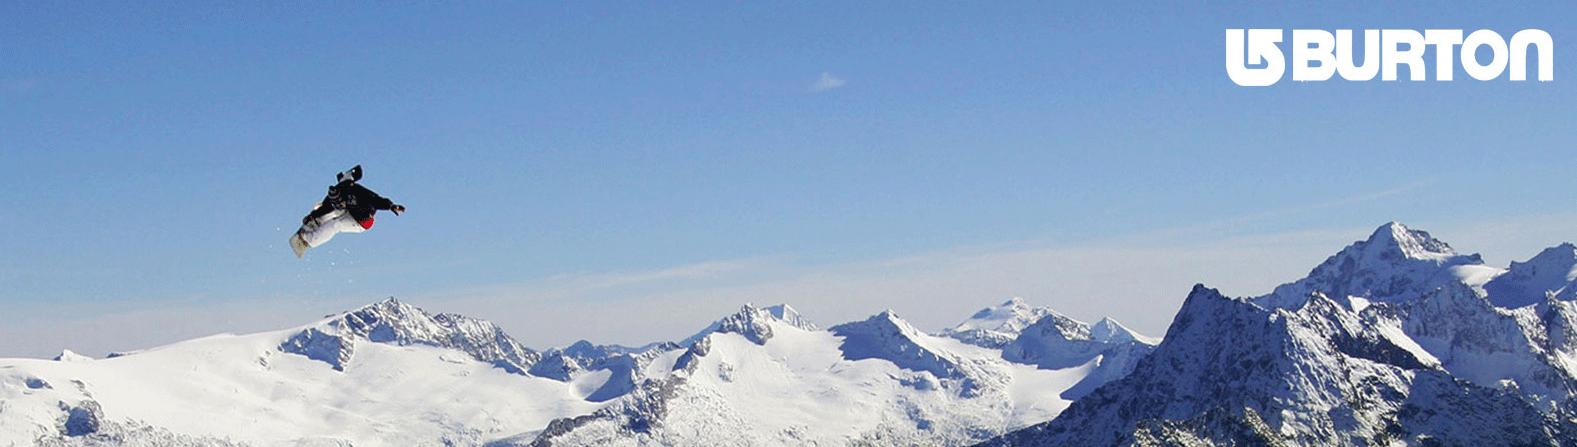 burton-snowboards-banner-01.png